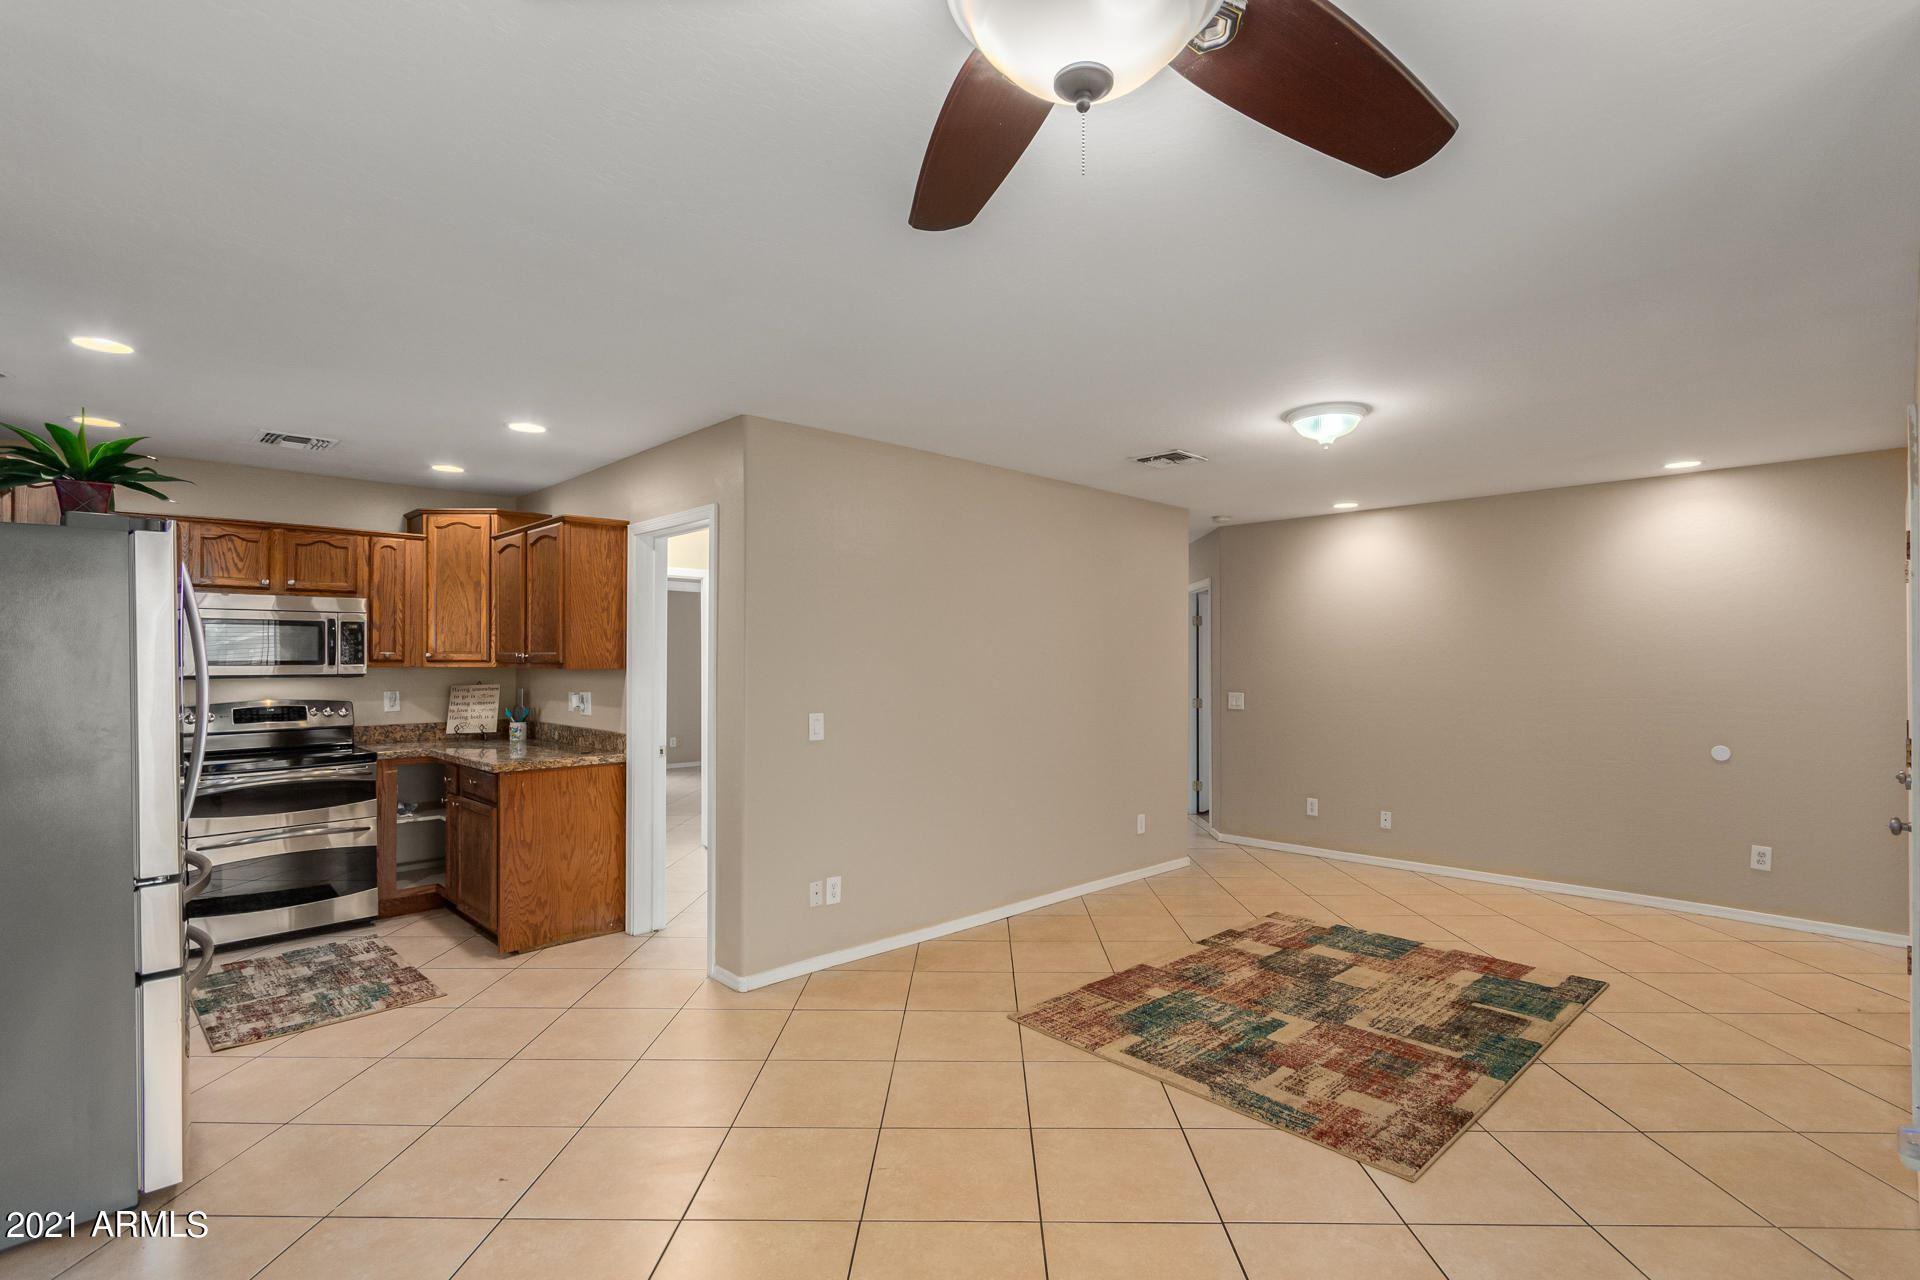 Photo of 15614 N JERRY Street, Surprise, AZ 85378 (MLS # 6271865)